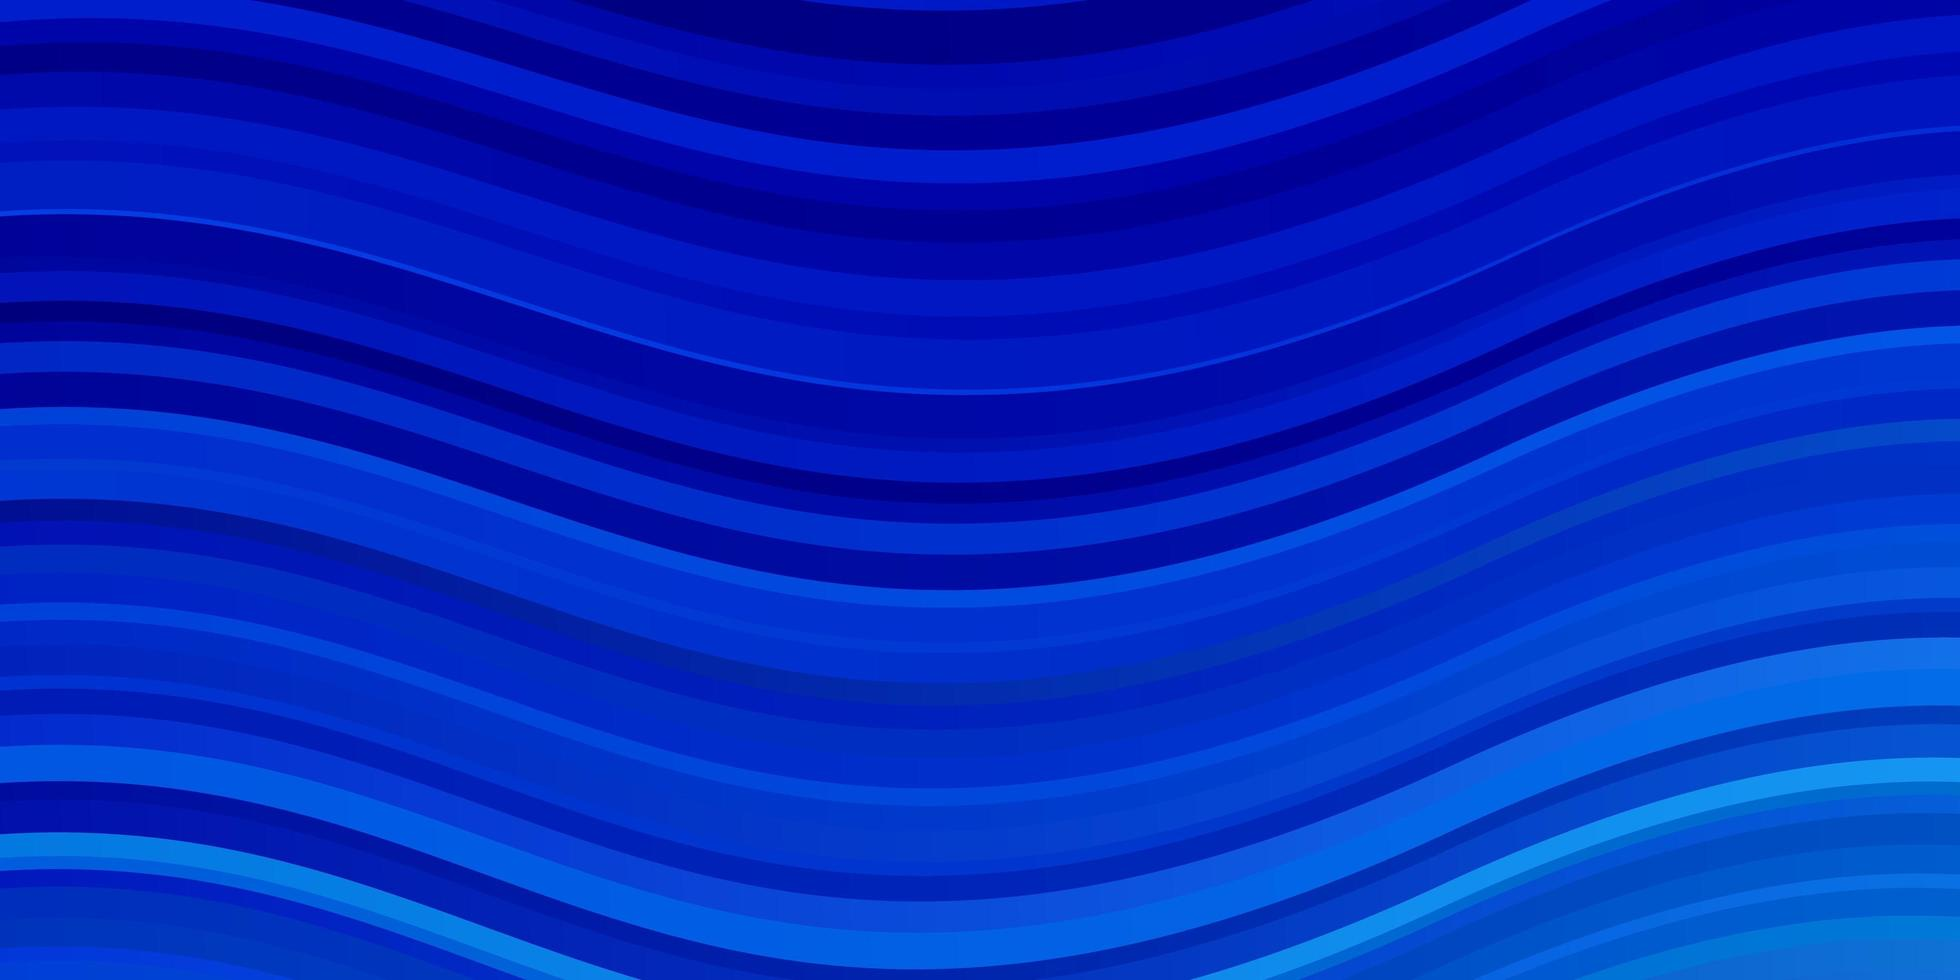 hellblaue Vektorschablone mit gekrümmten Linien. vektor